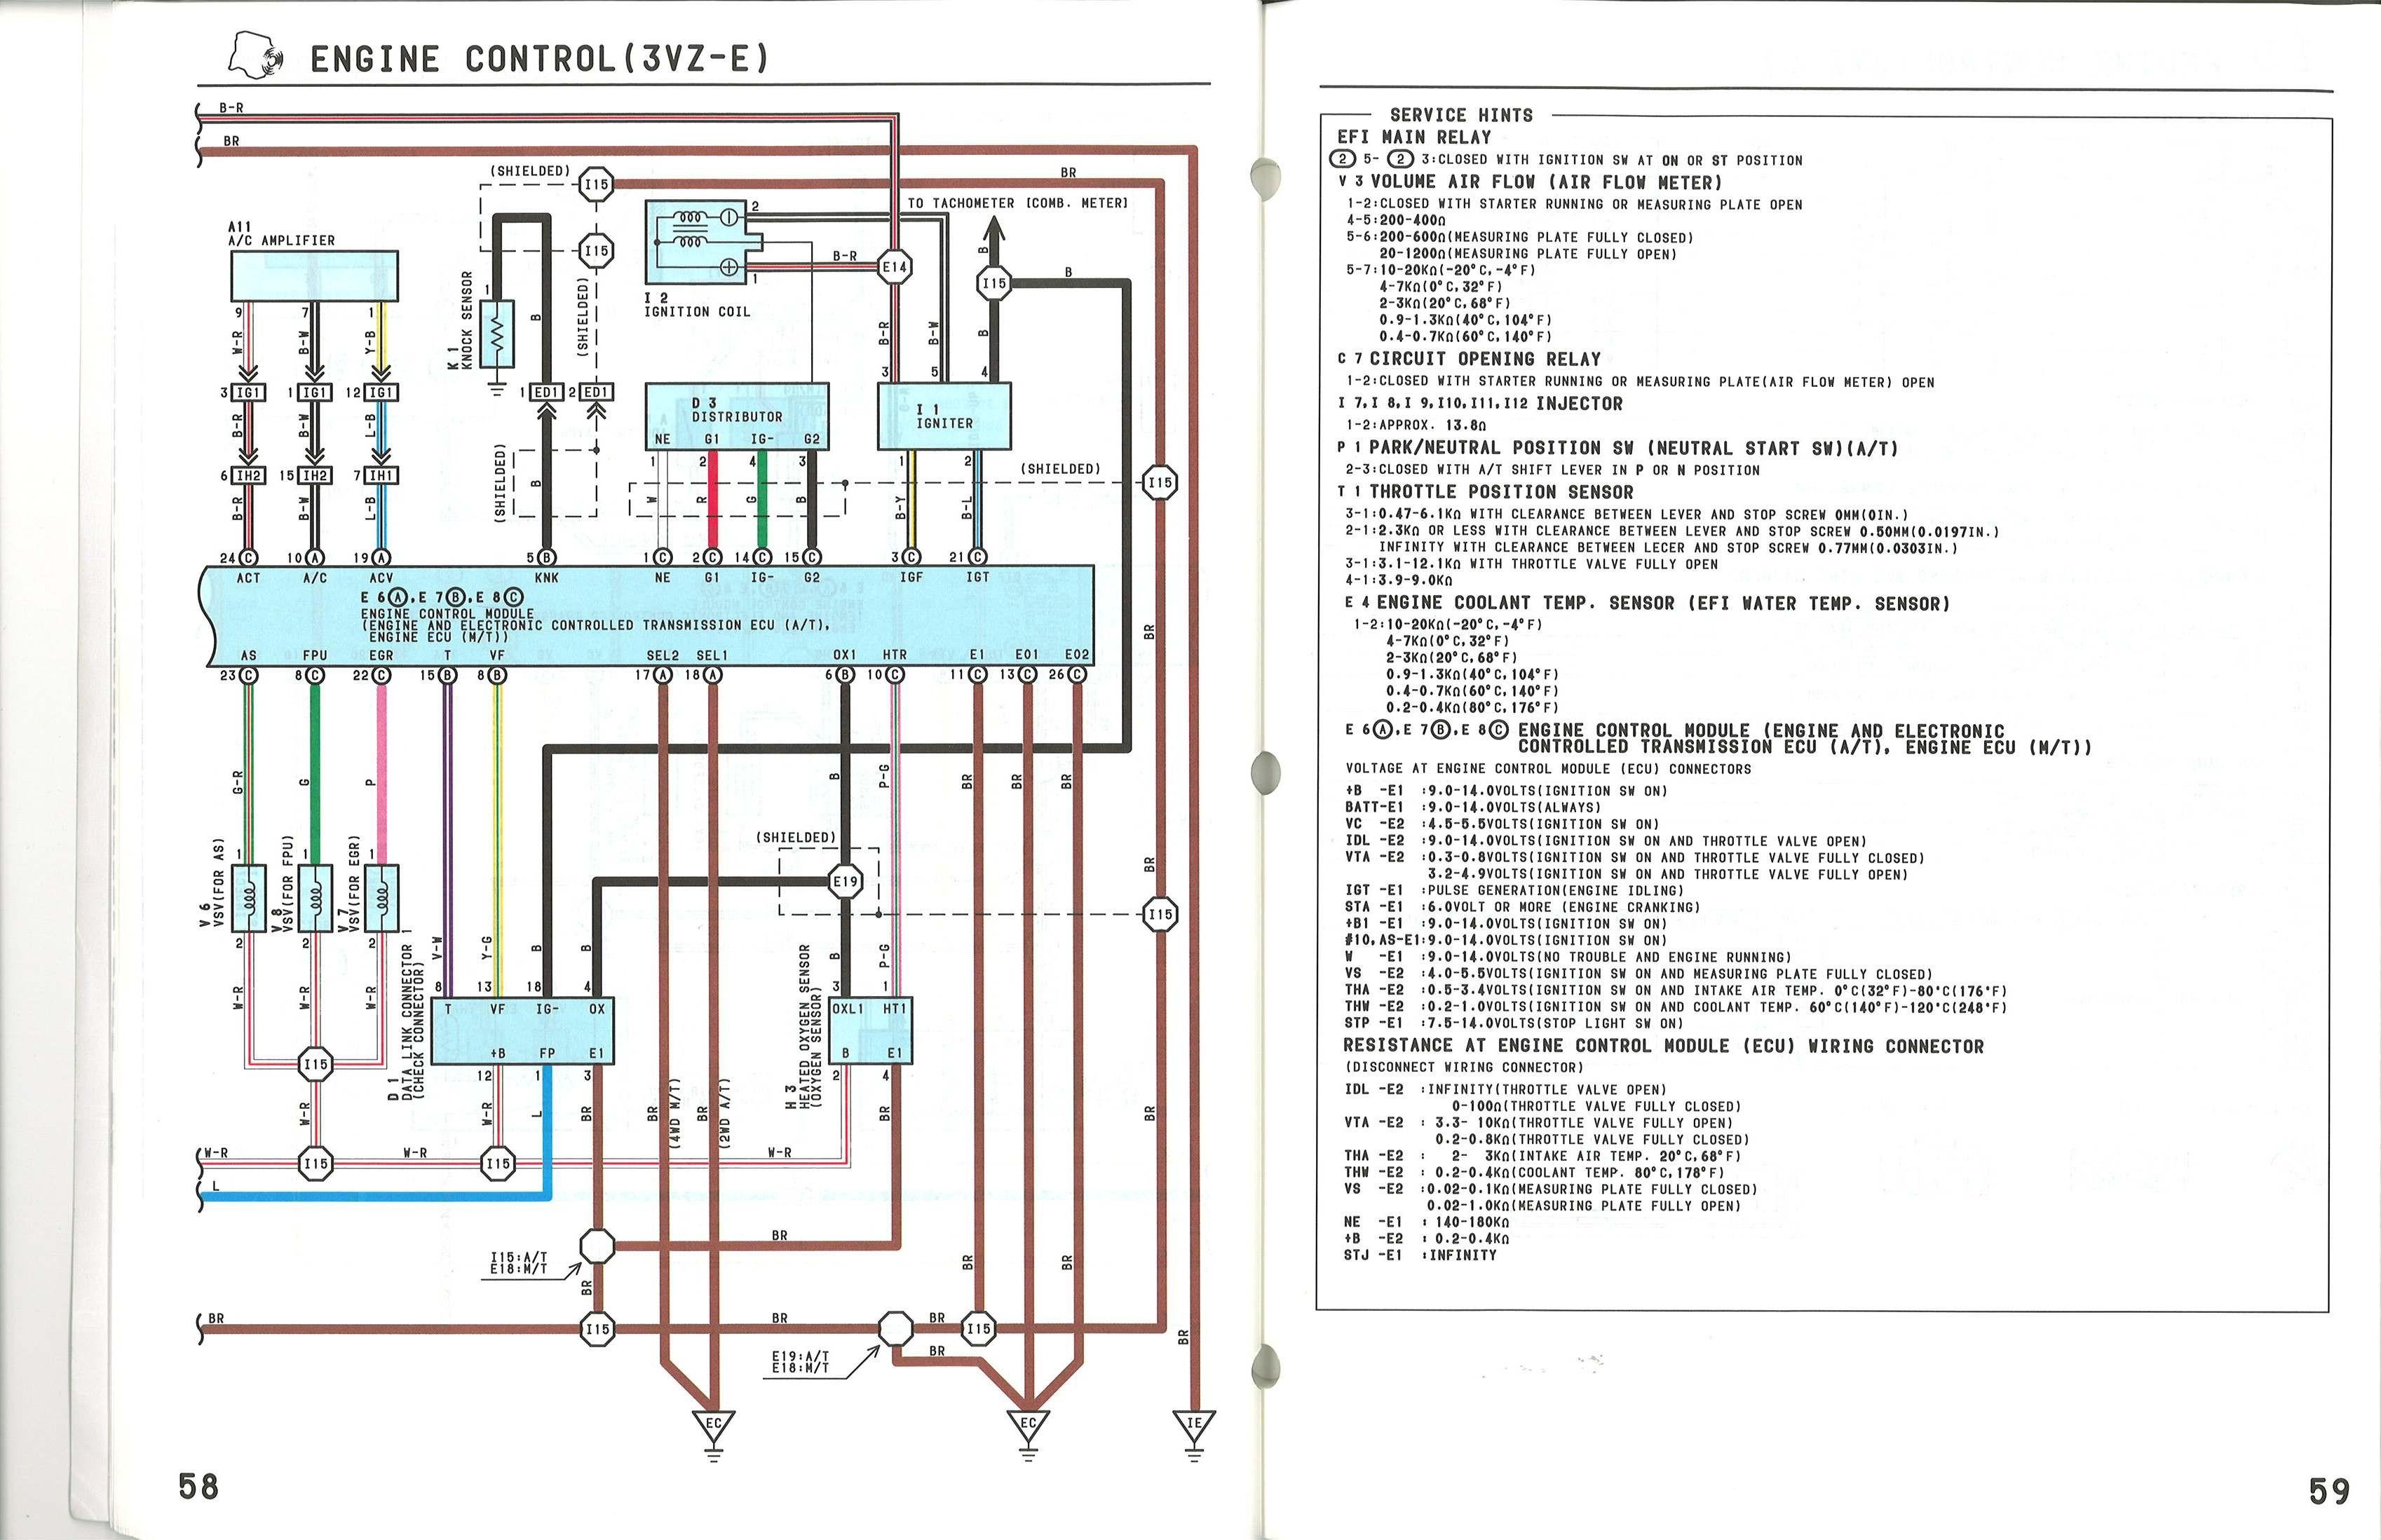 Gramin Wiring for Stricker 4 02 Camry Knock Sensor Wiring Diagram Of Gramin Wiring for Stricker 4